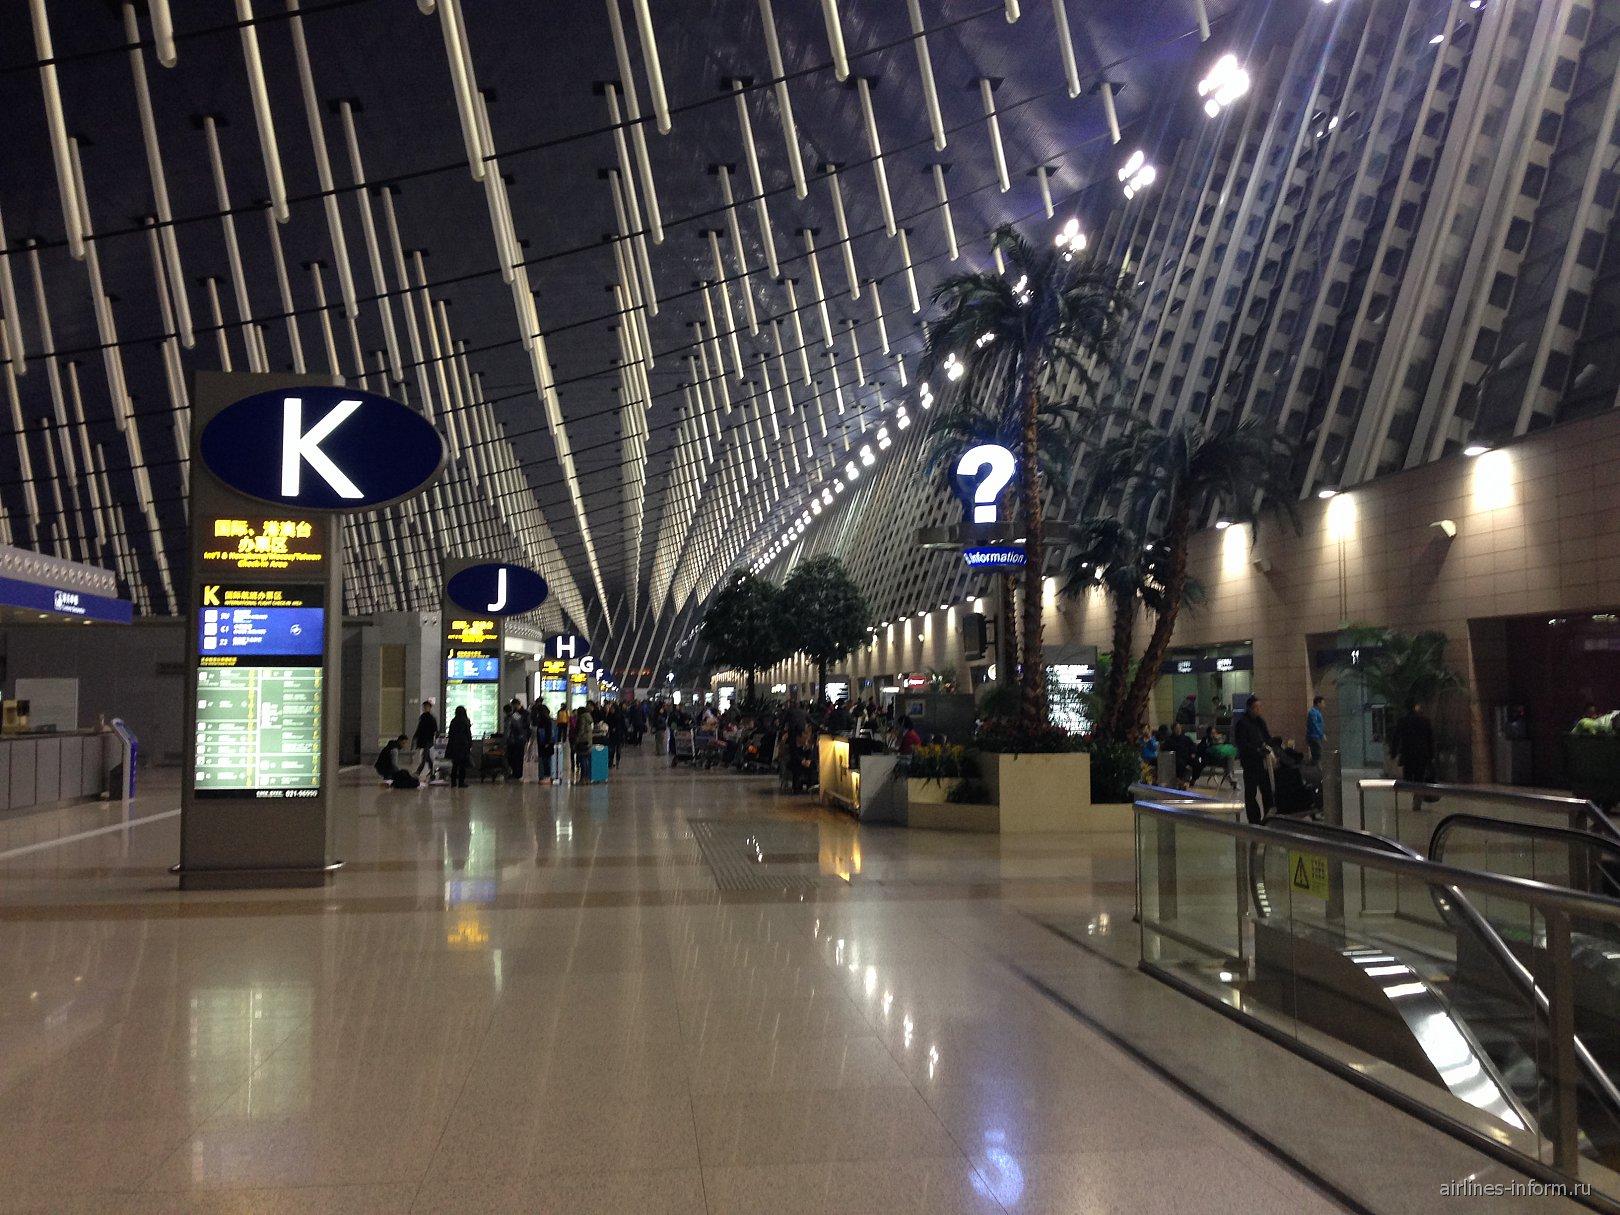 В терминале 1 аэропорта Шанхай Пудун